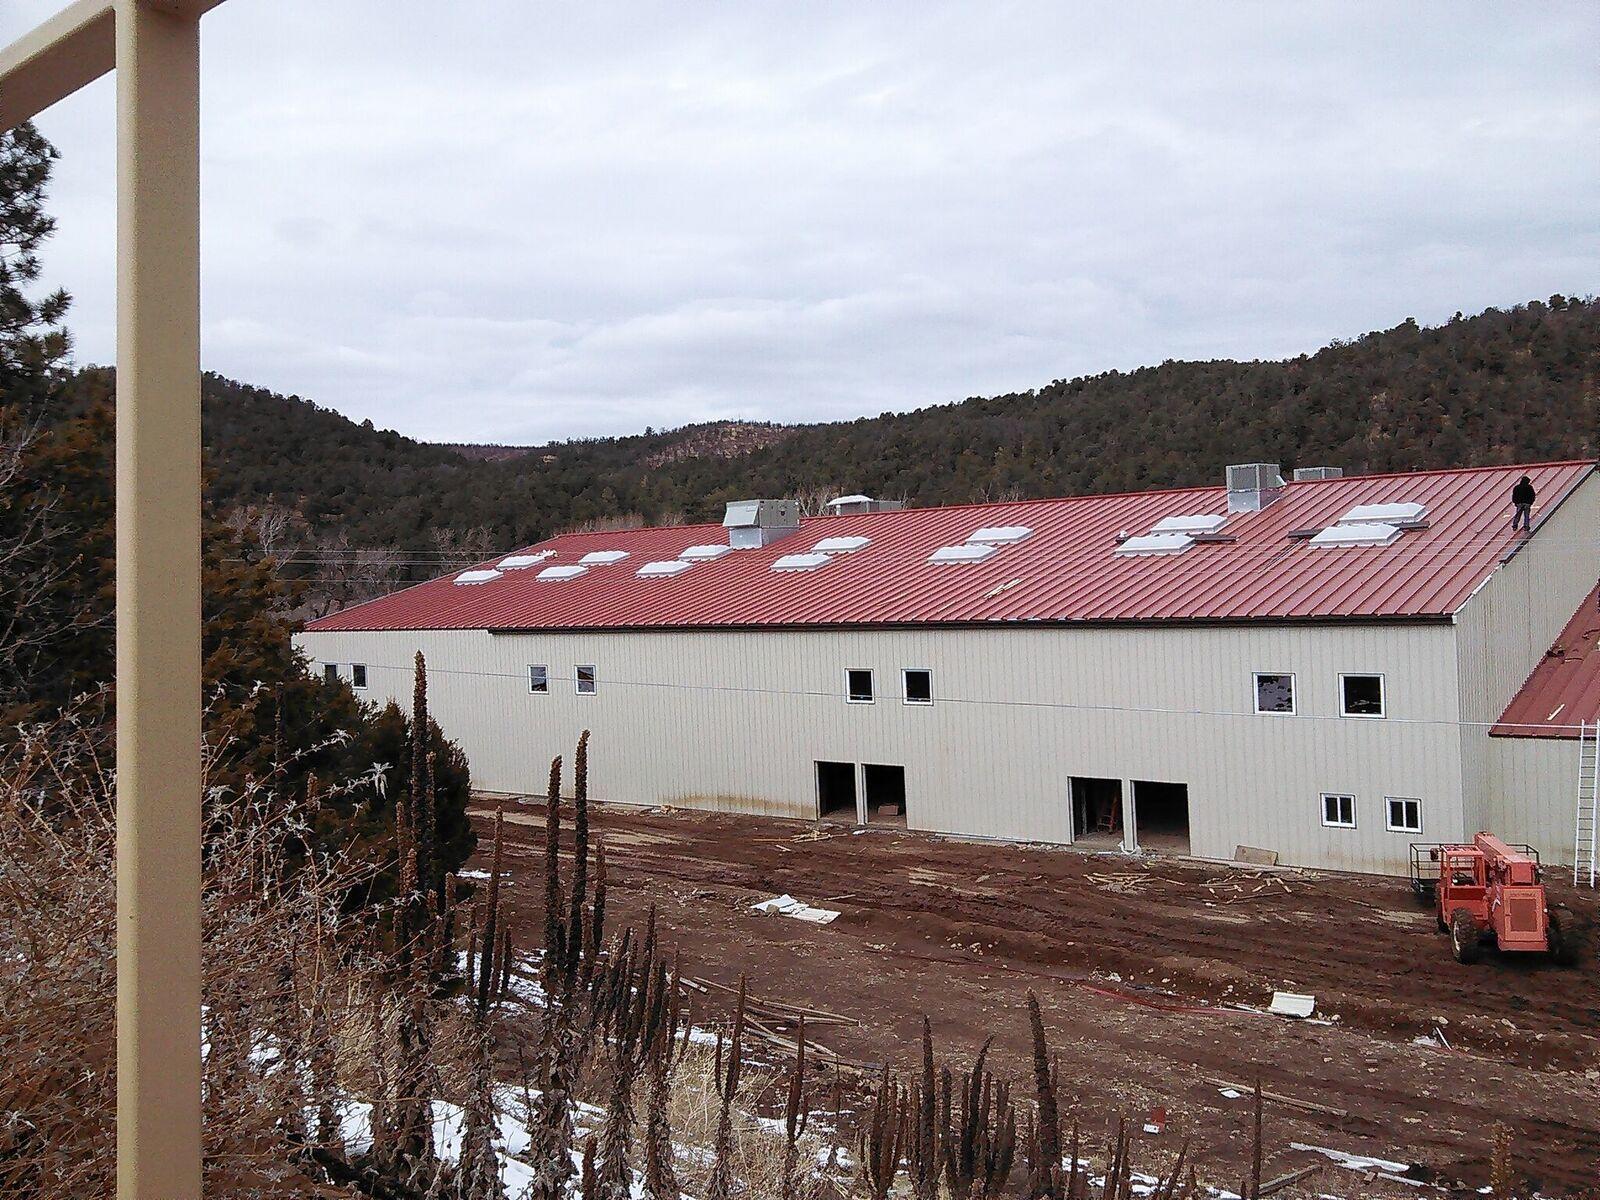 Professional Roofers & Contractors image 1